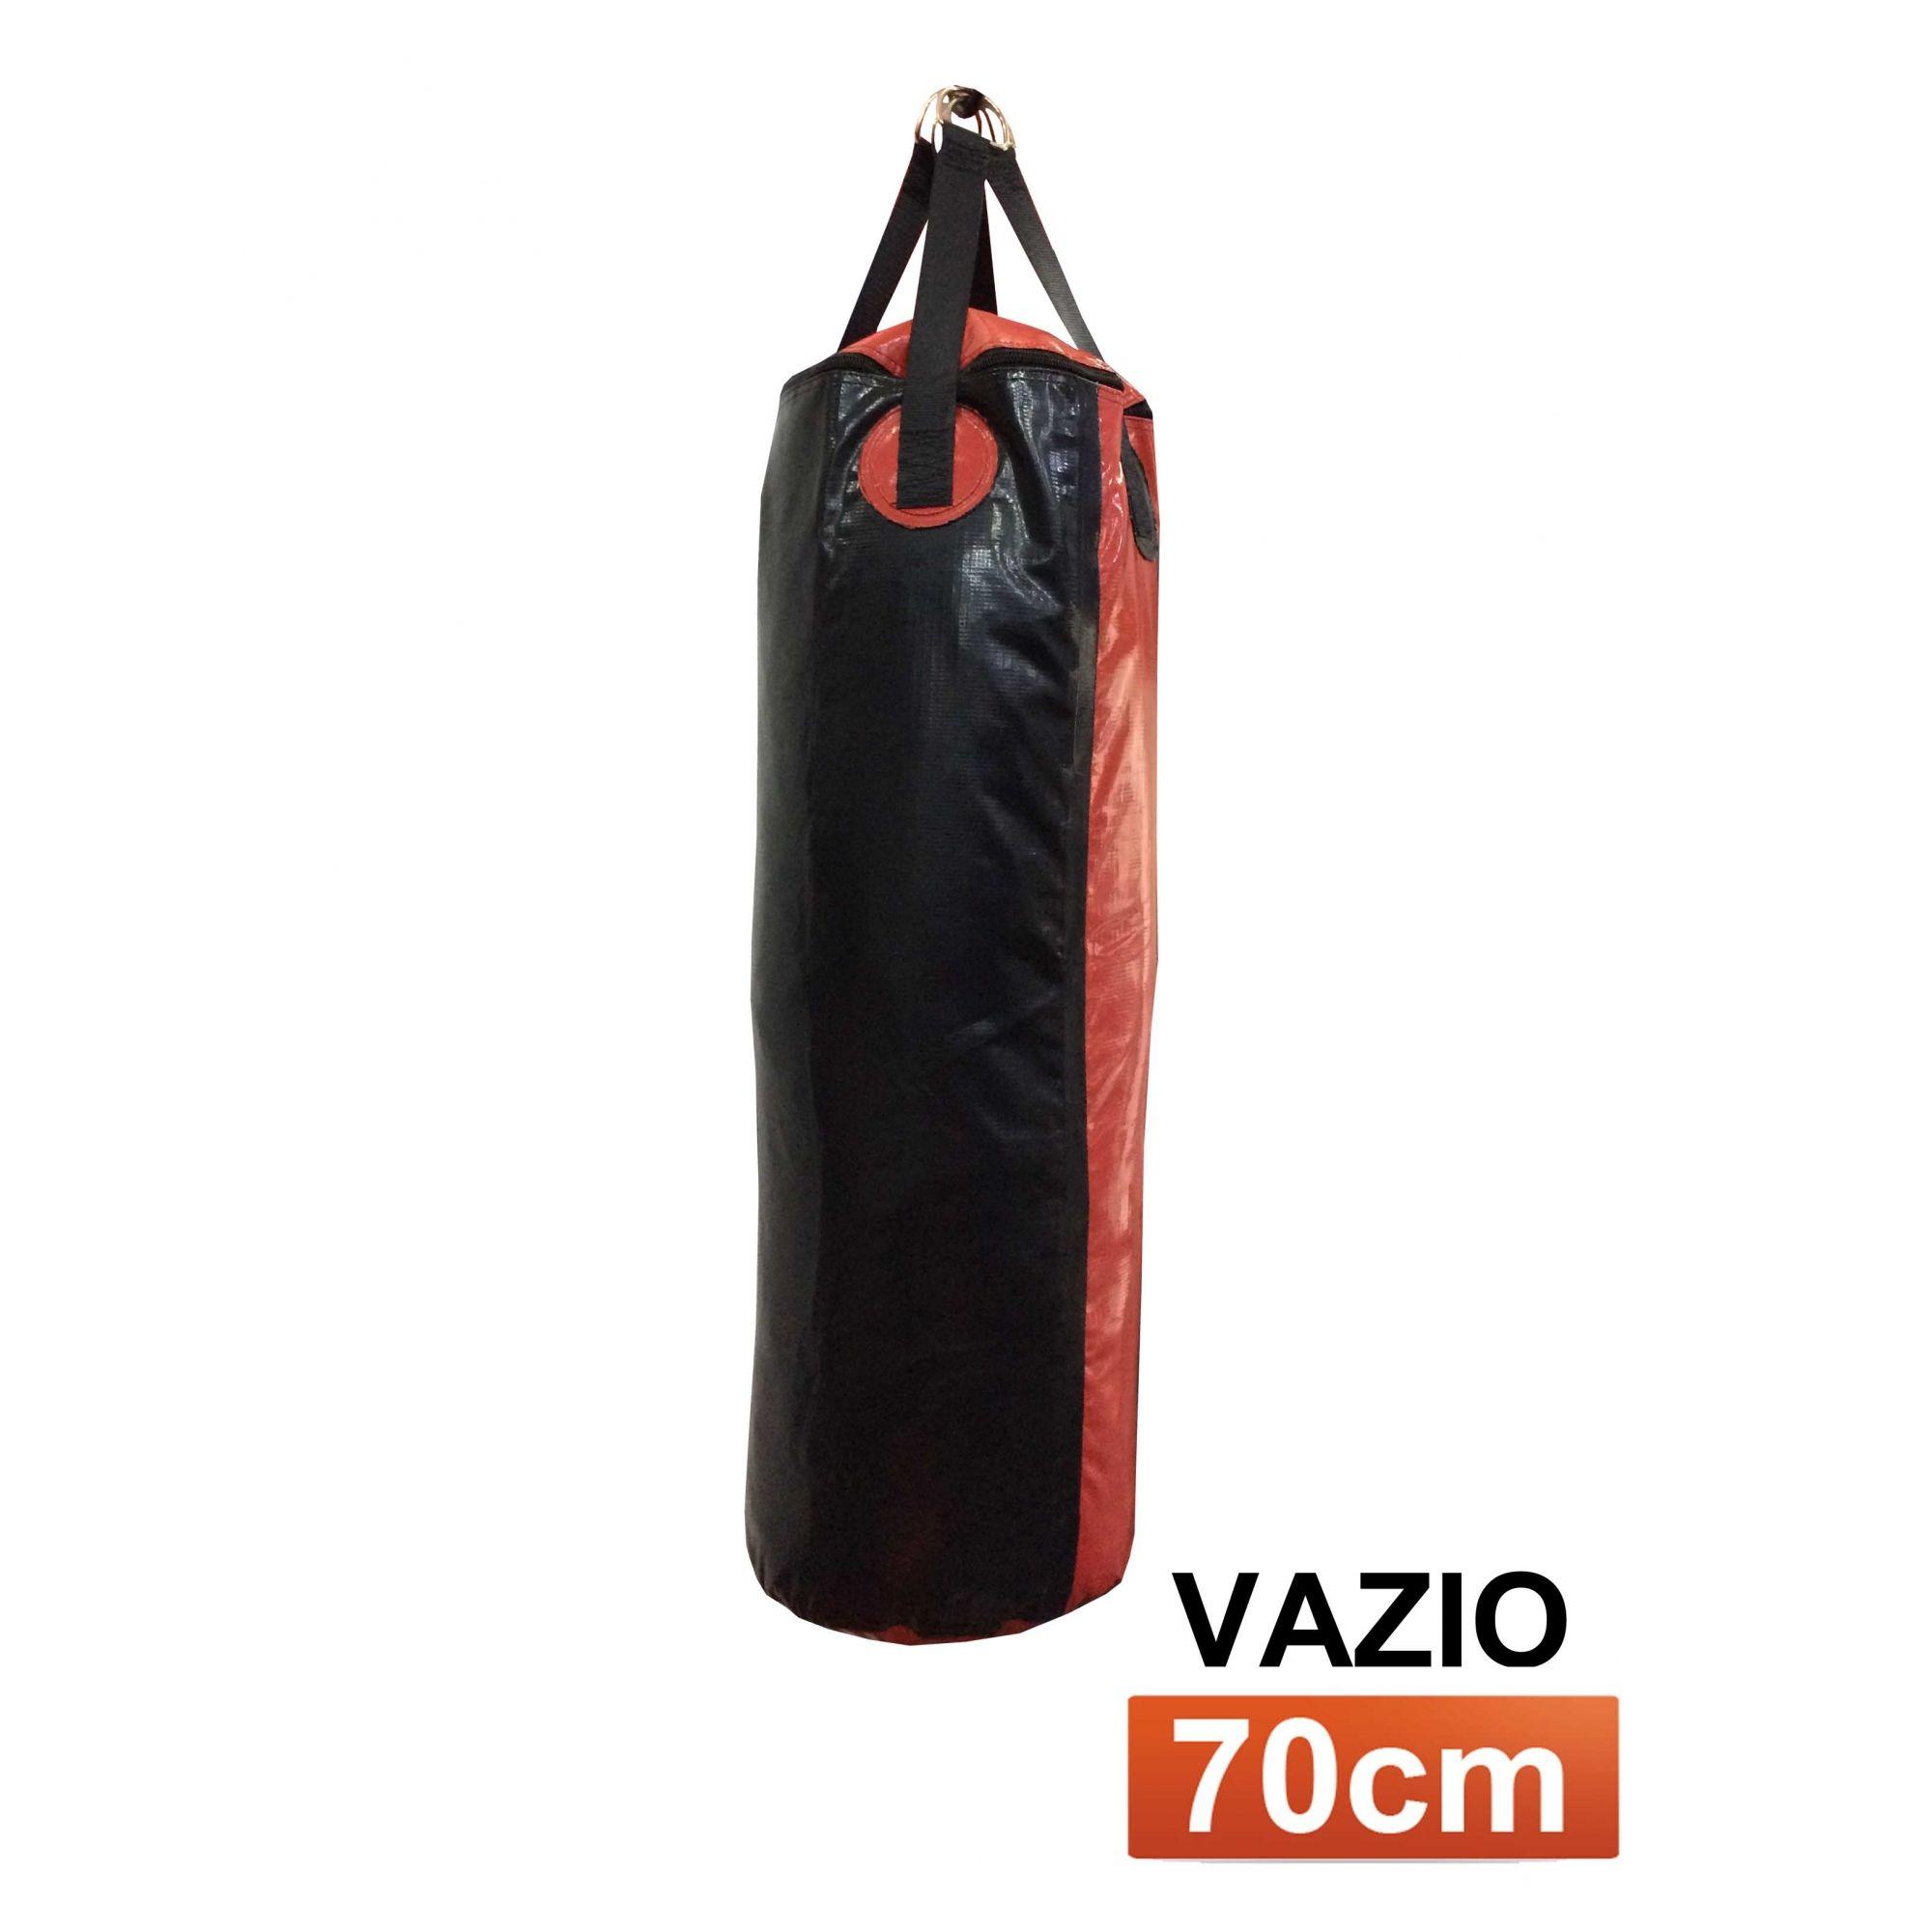 Saco de Pancadas - Lona Náutica - Vazio - 70cm - Toriuk